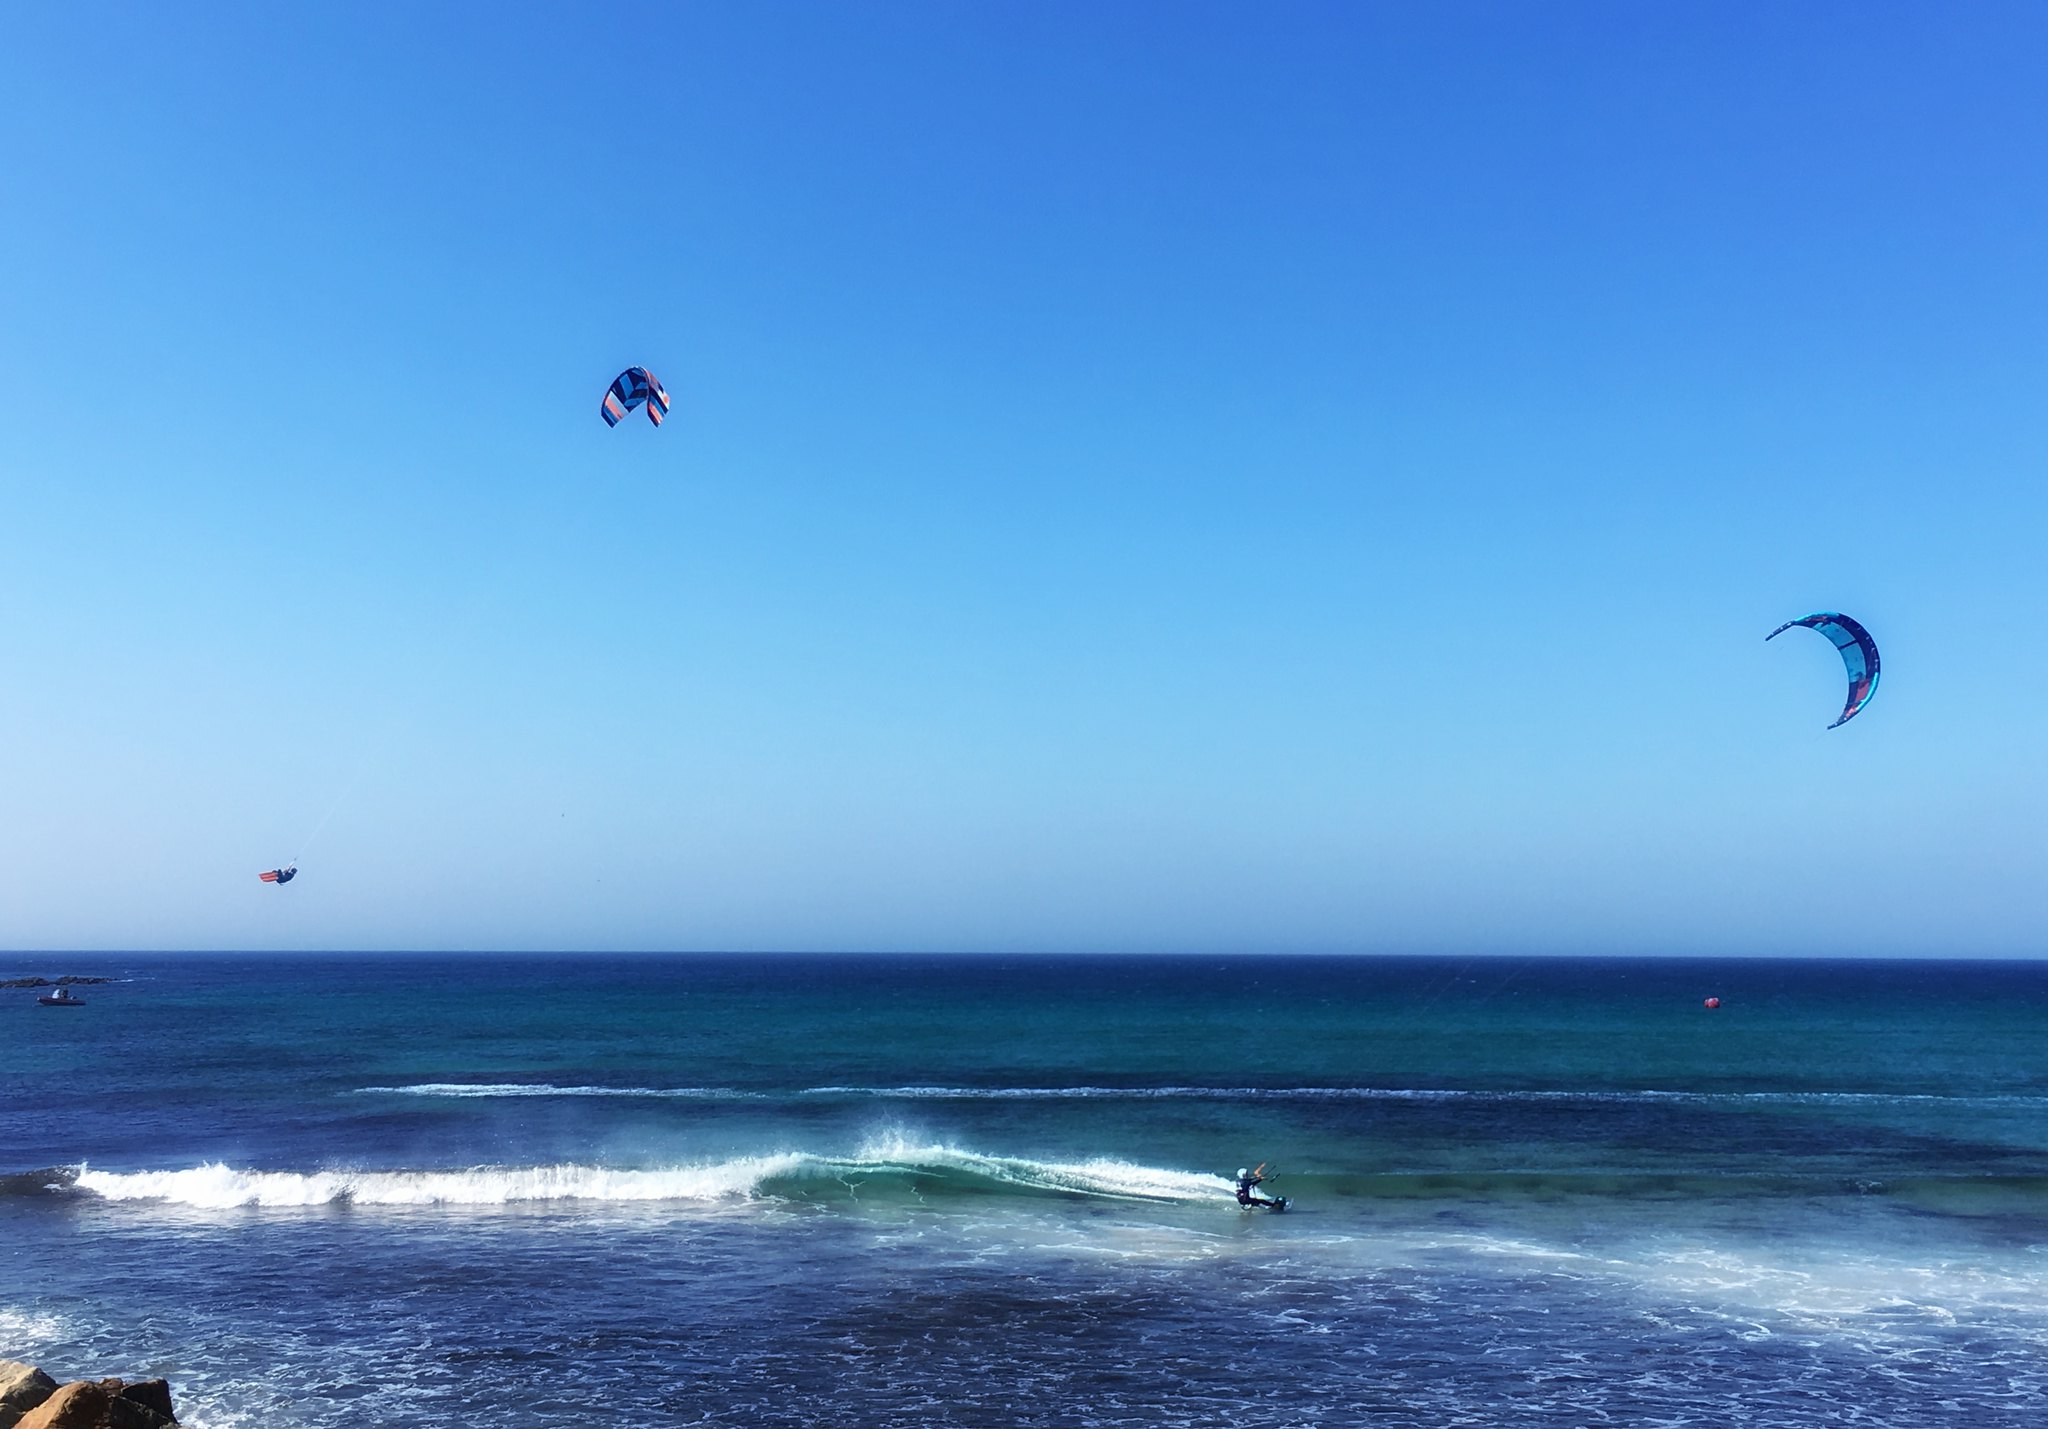 Kite surfing. (File Photo/ Credit: tortuga767/ Flickr)